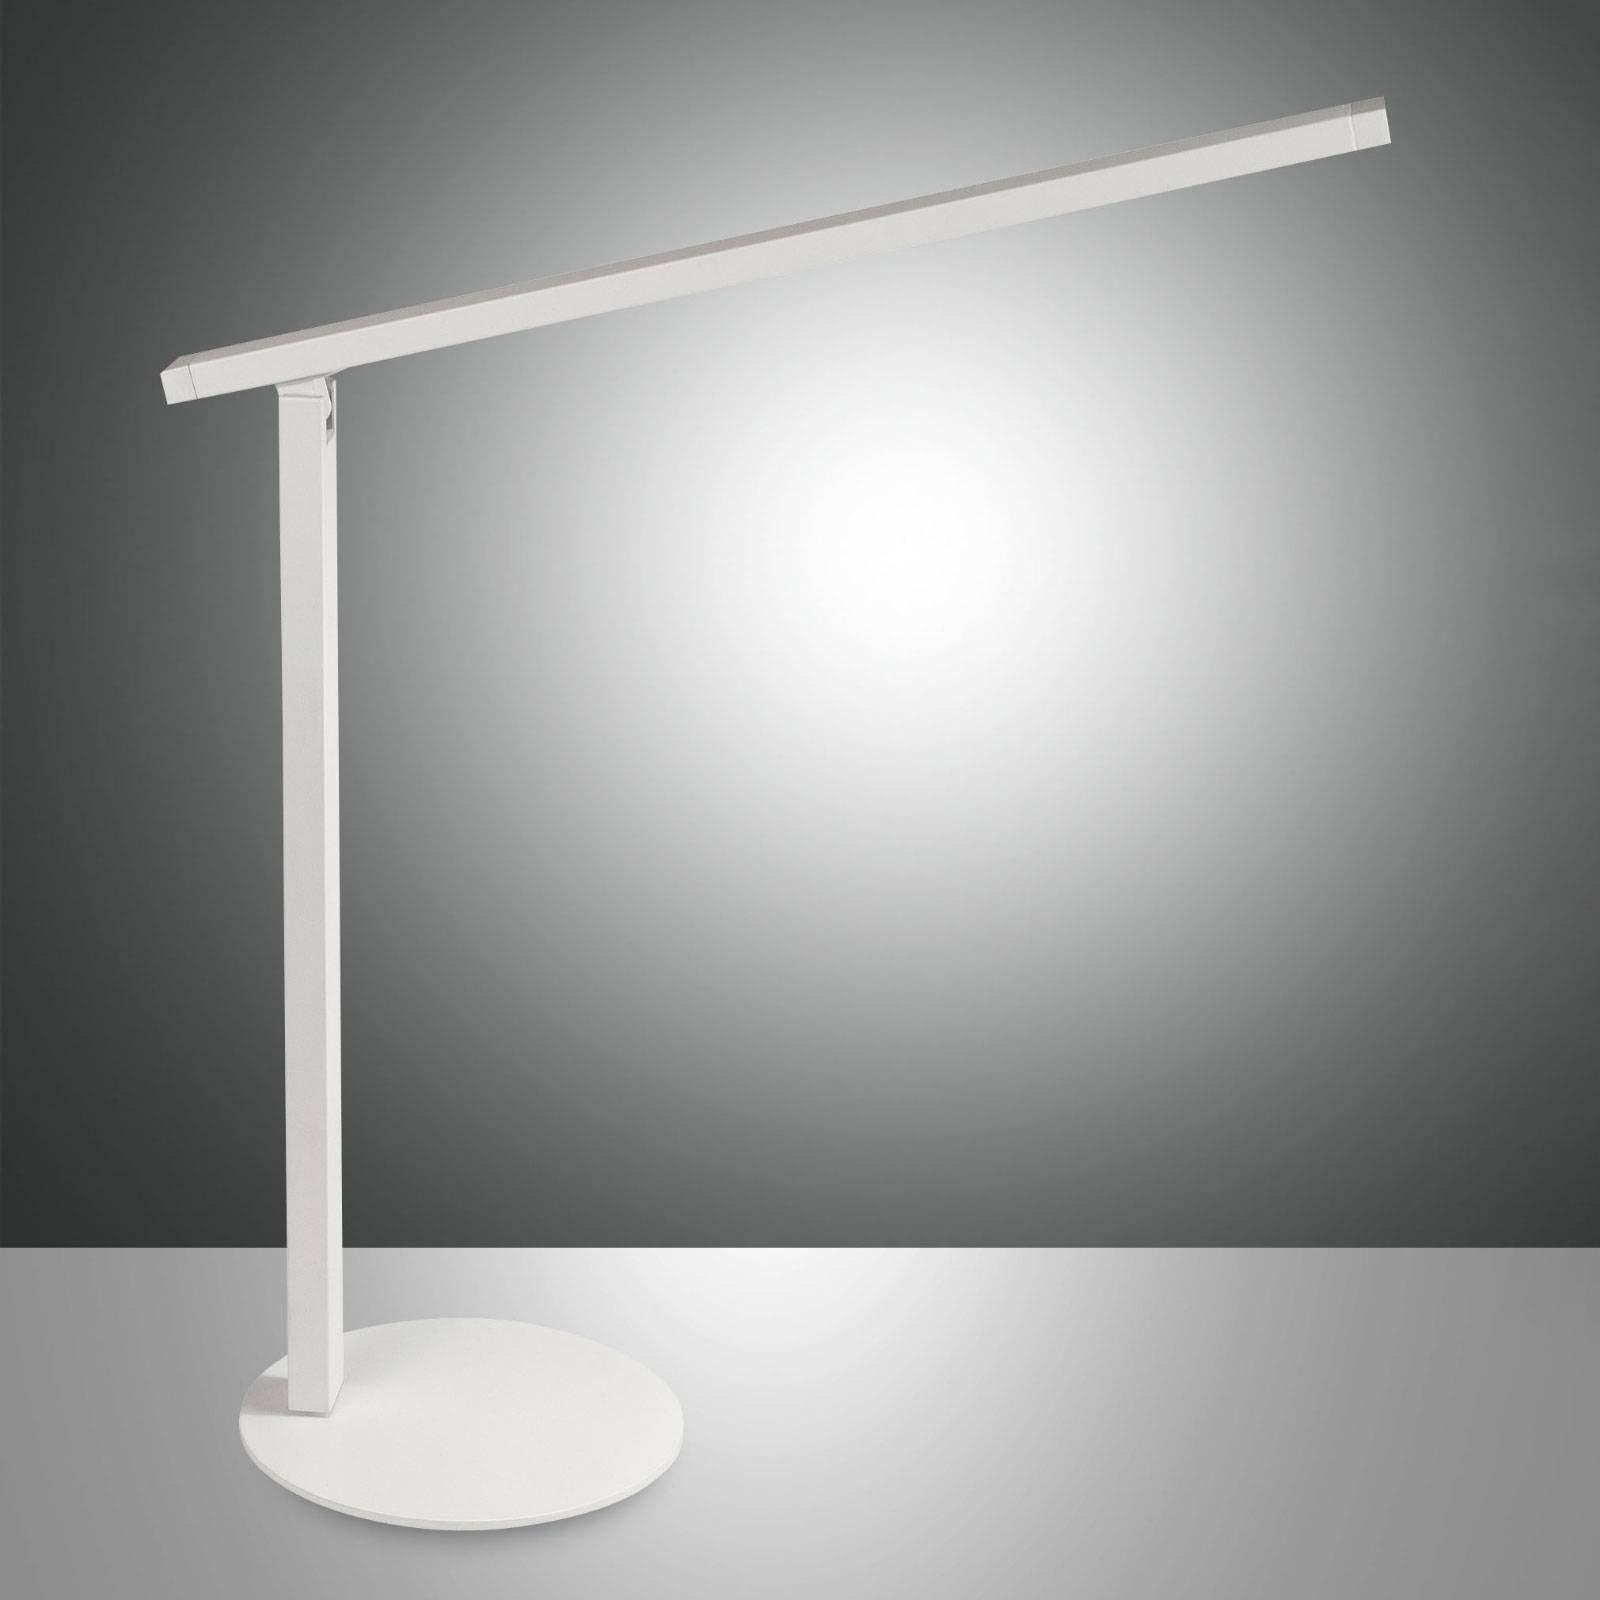 LED-skrivebordslampe Ideal med dimmer, hvit